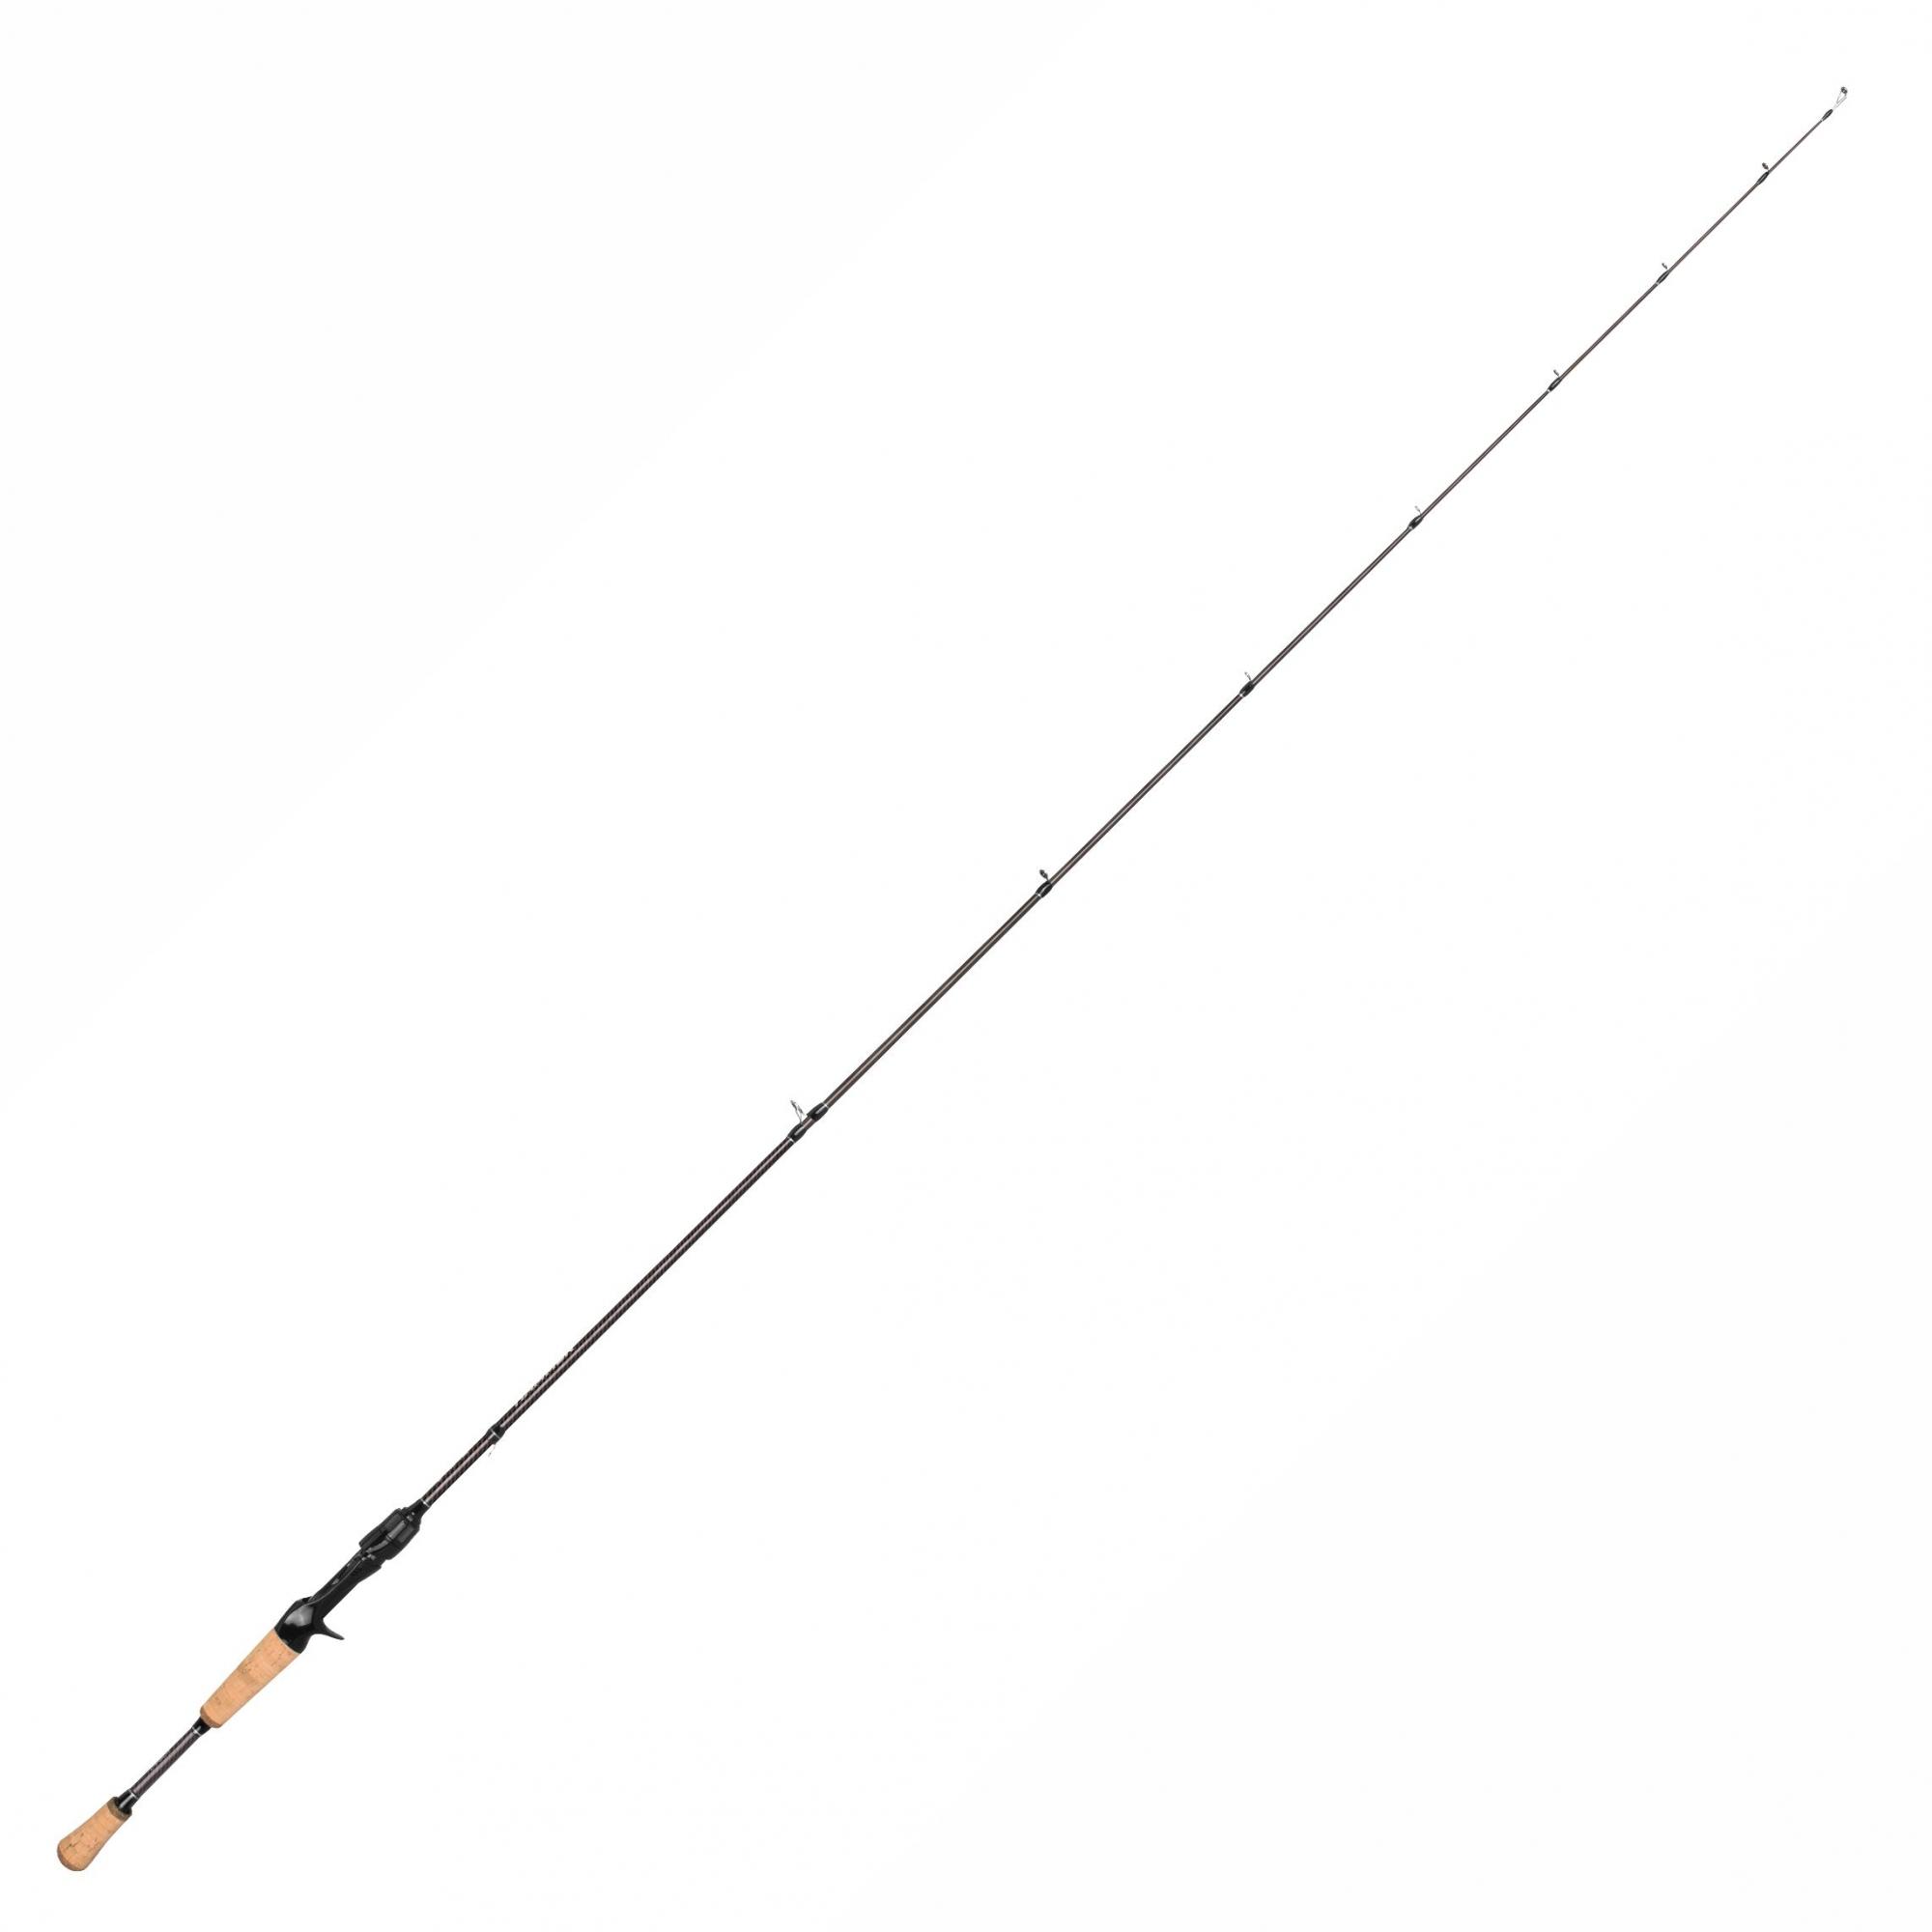 Vara Saint Hammer 581 1,73m 4-12LB p/ Carretilha   - Pesca Adventure